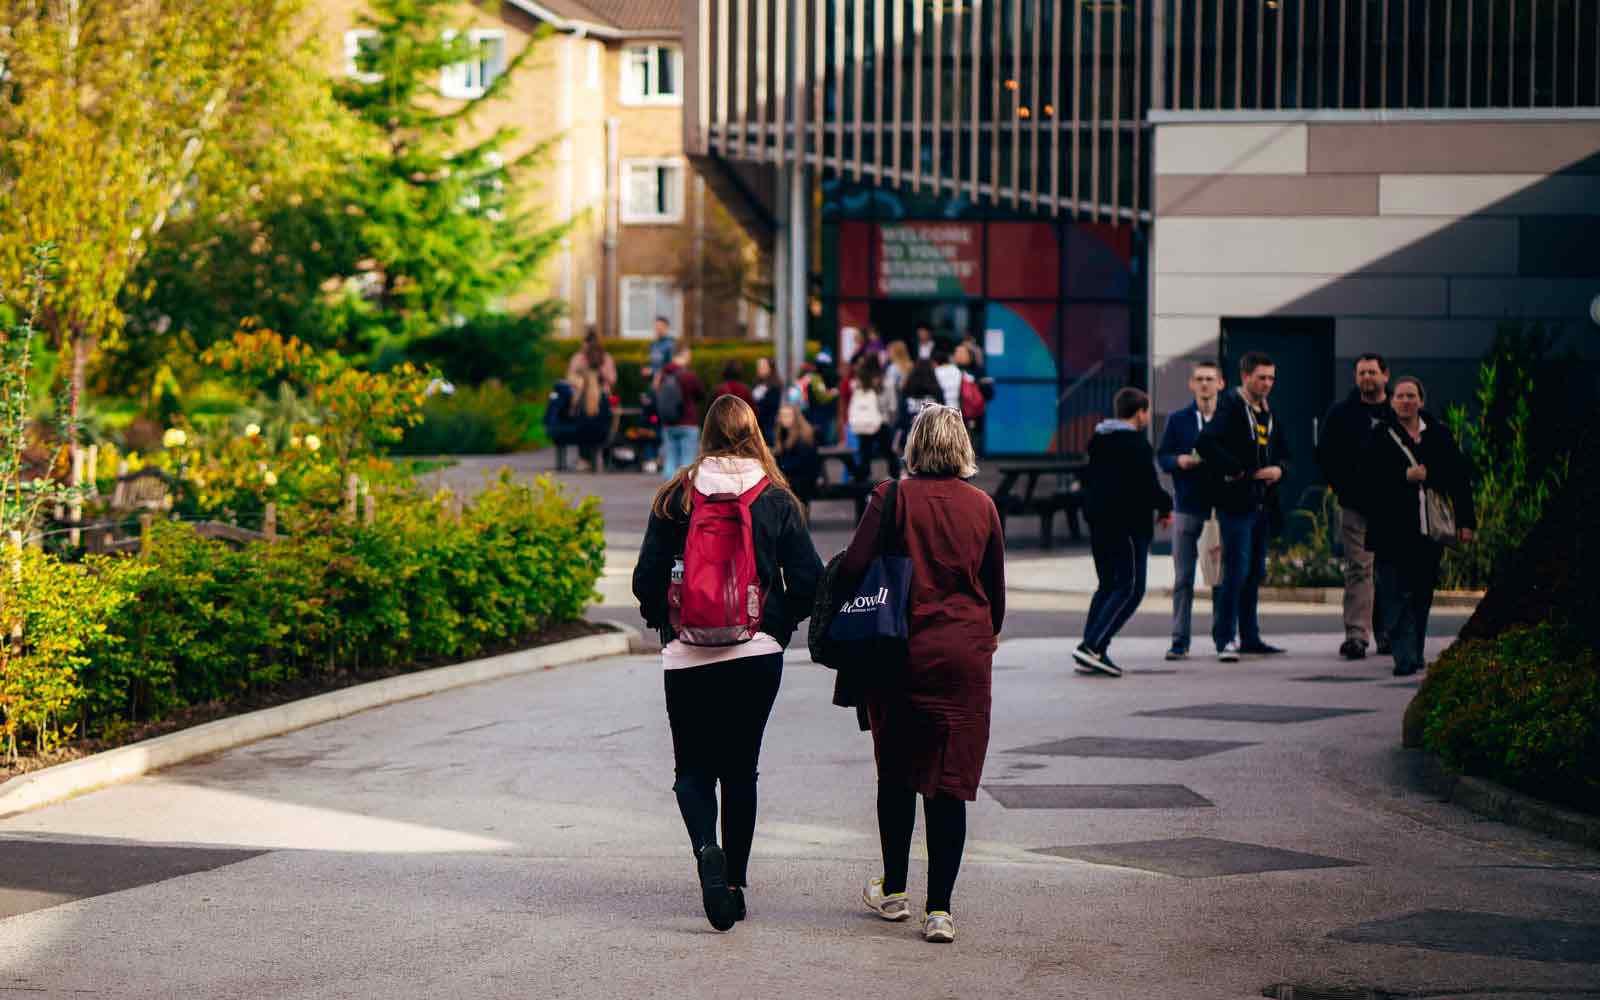 Students walking towards campus building